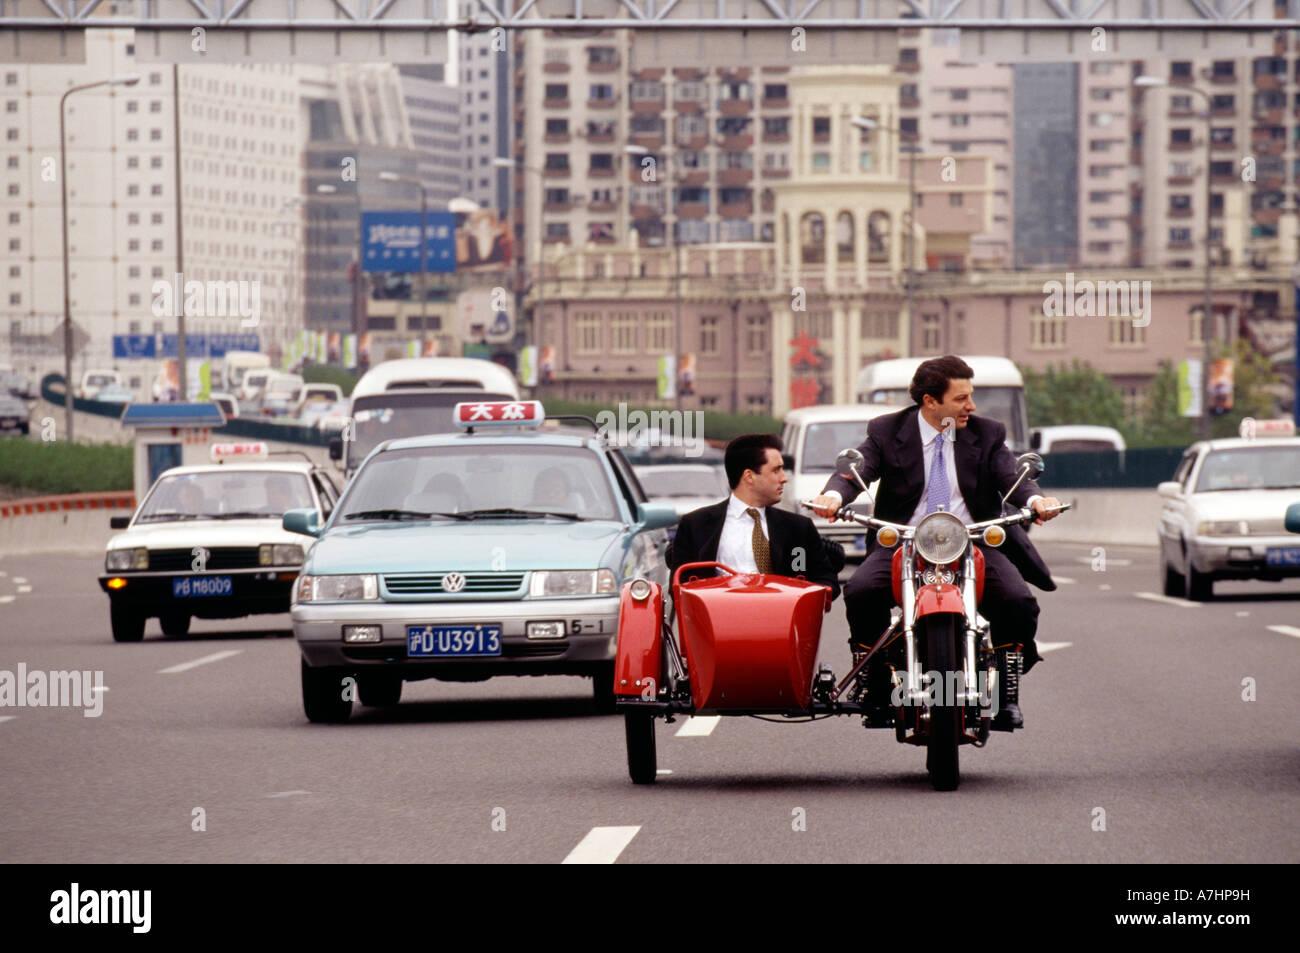 Sidecar Stock Photos & Sidecar Stock Images - Alamy